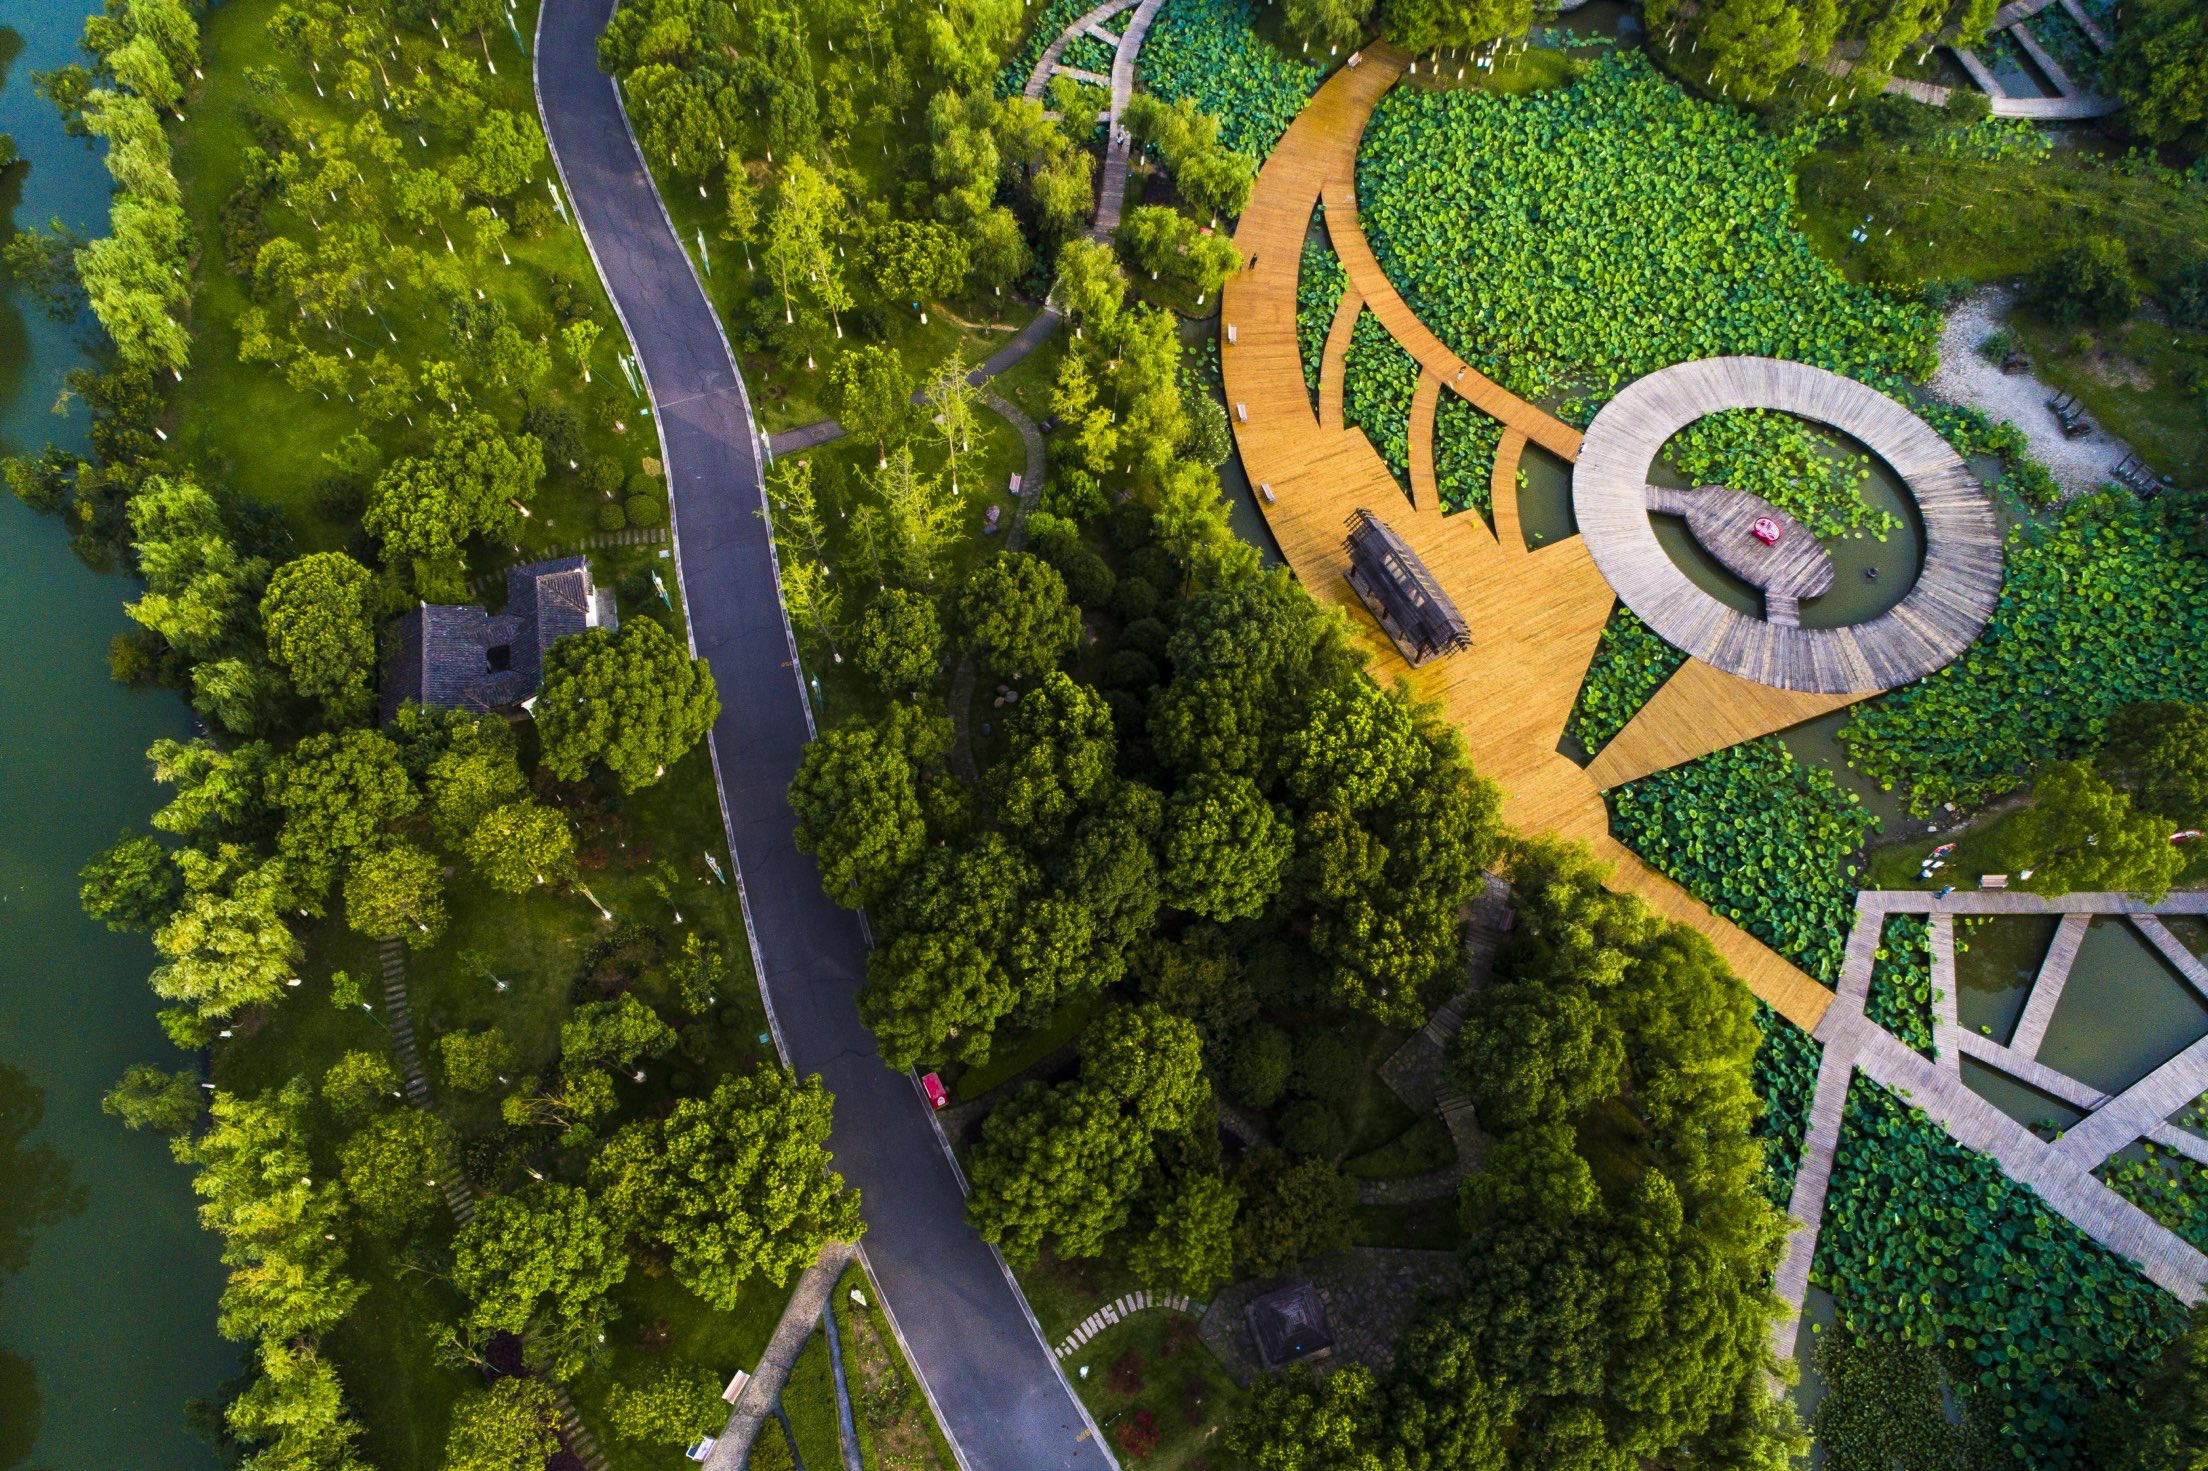 Jinping Park